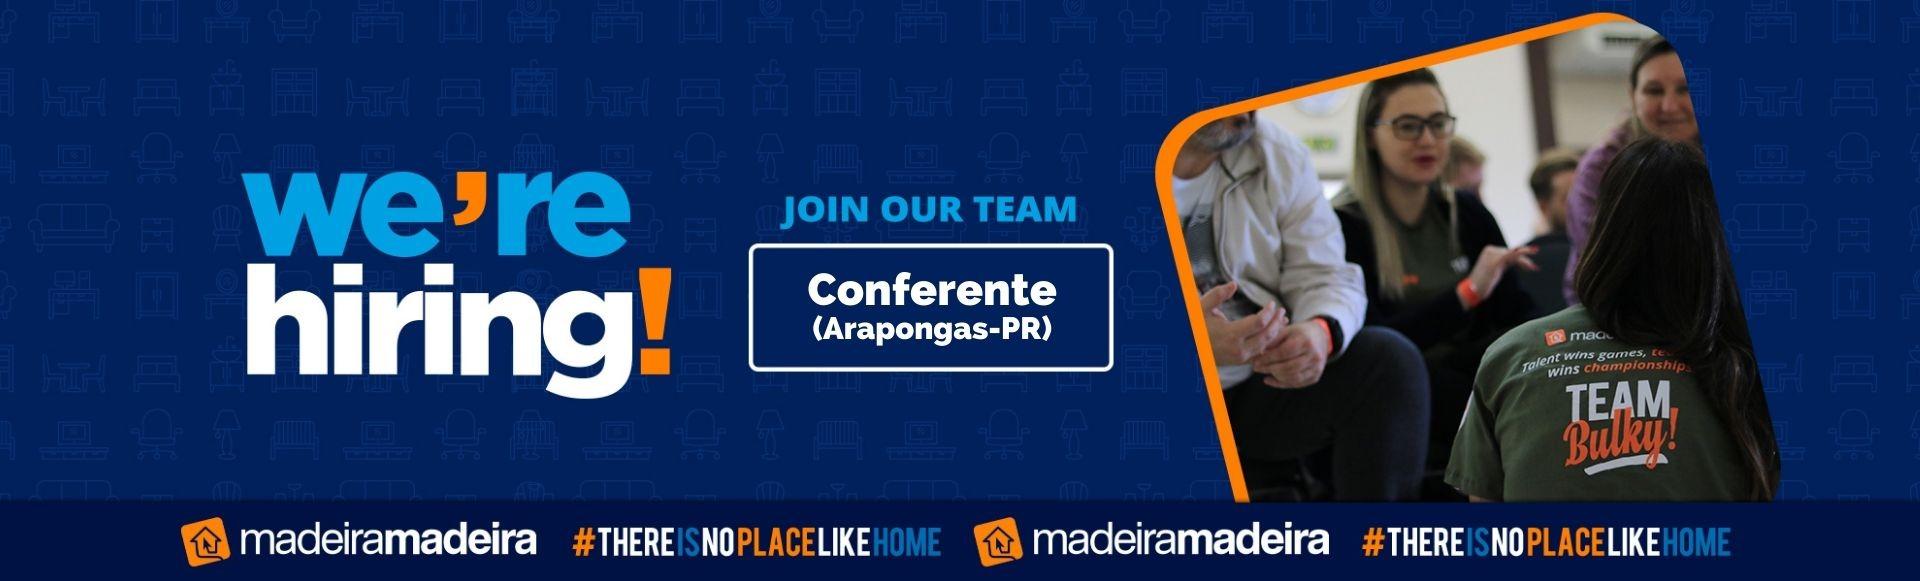 Conferente (Arapongas-PR)